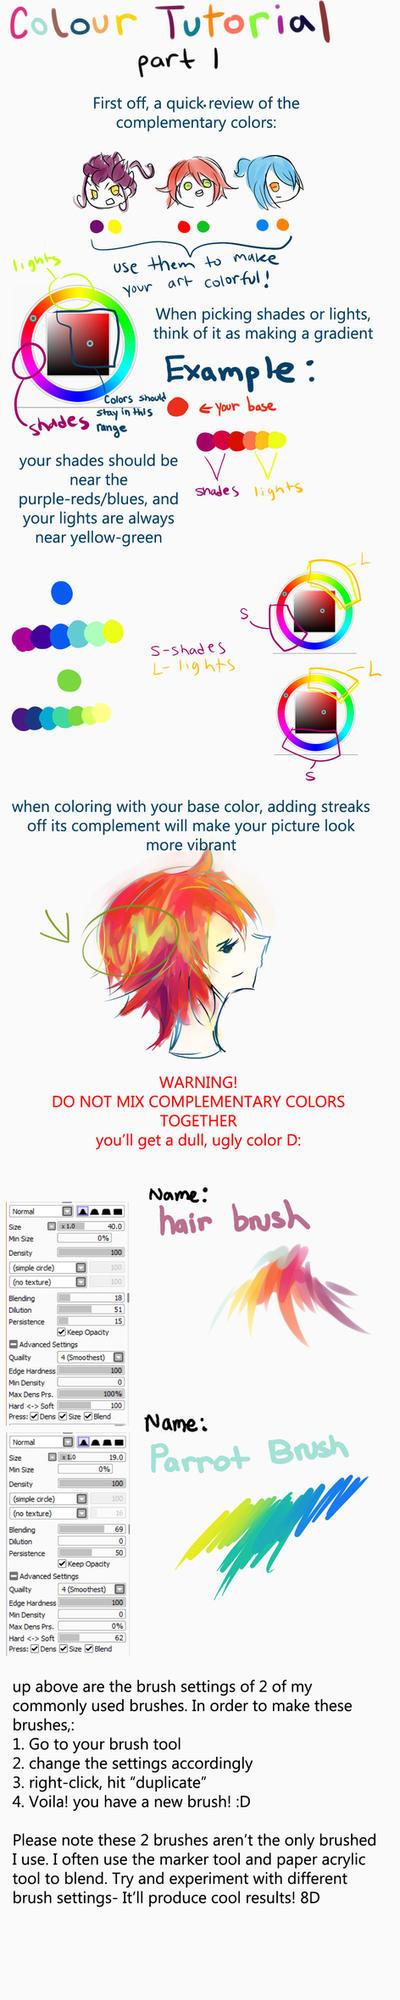 Color Tutorial Part I by friendwish